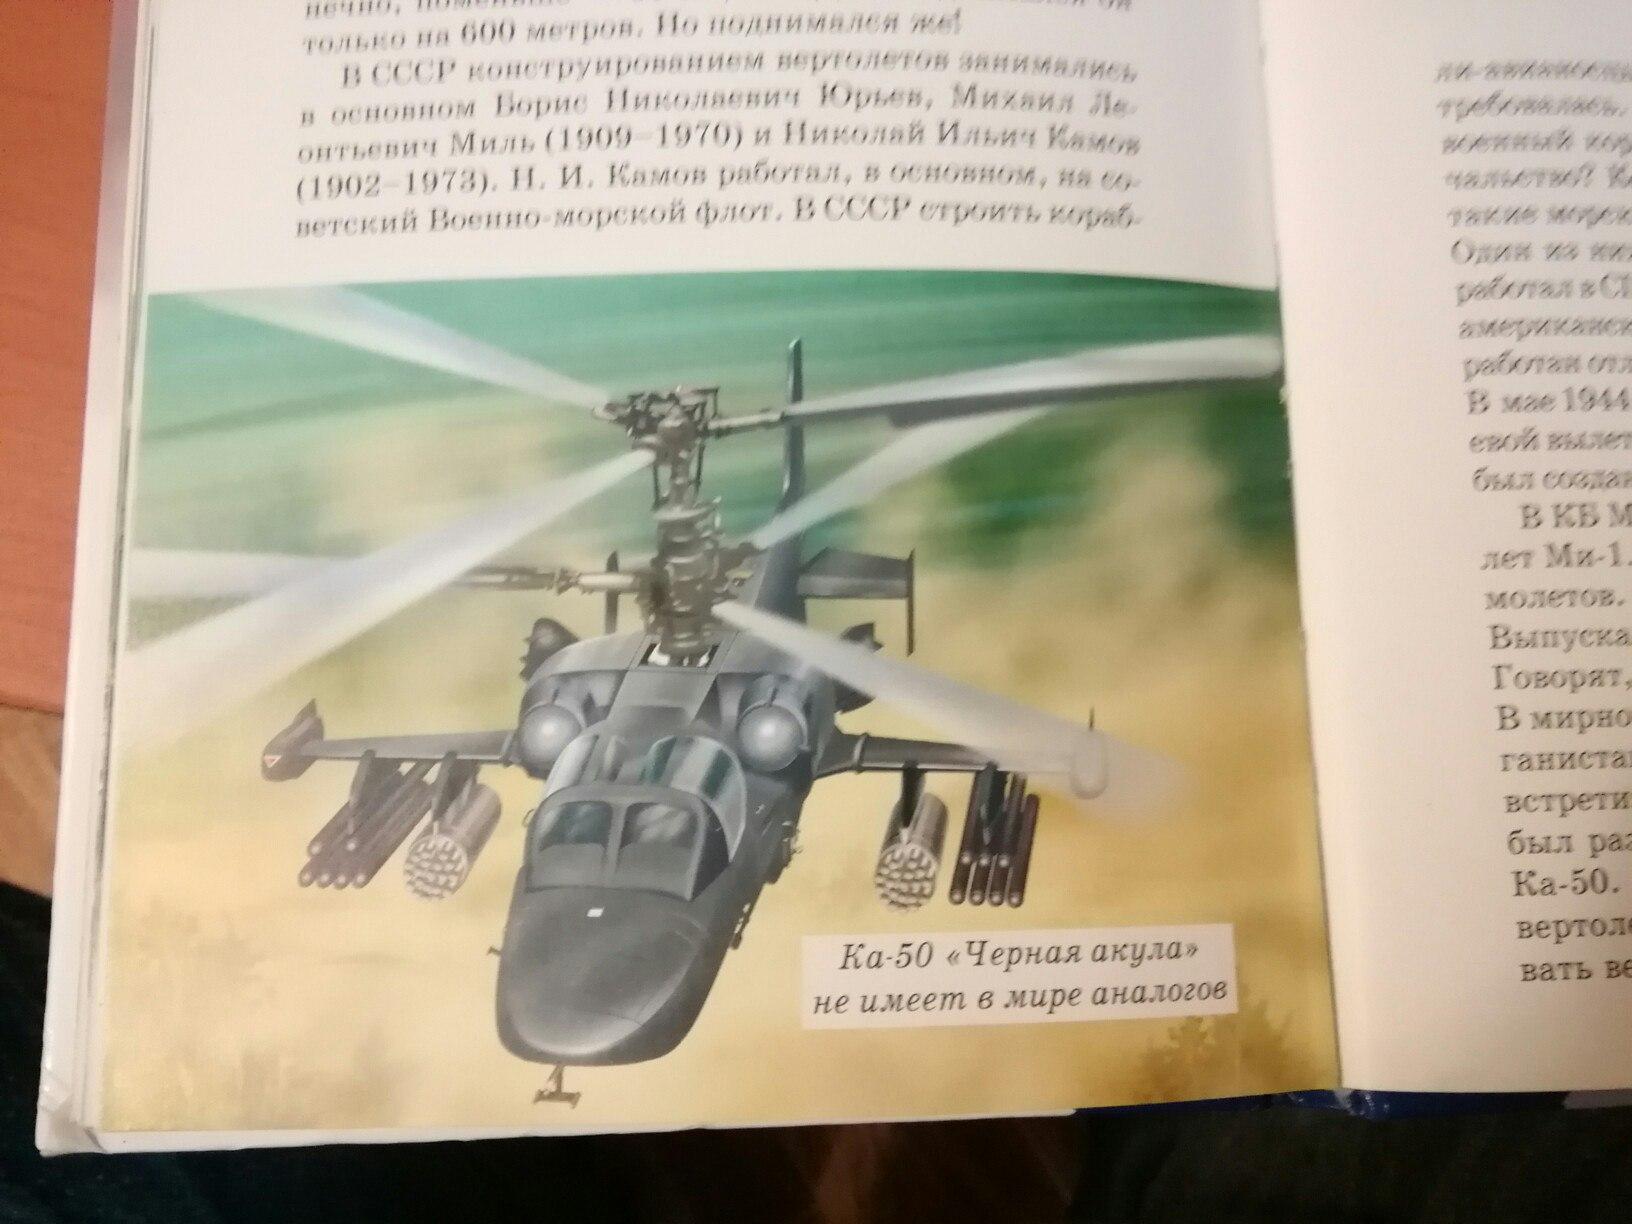 https://ic.pics.livejournal.com/yuripasholok/765139/5021077/5021077_original.jpg